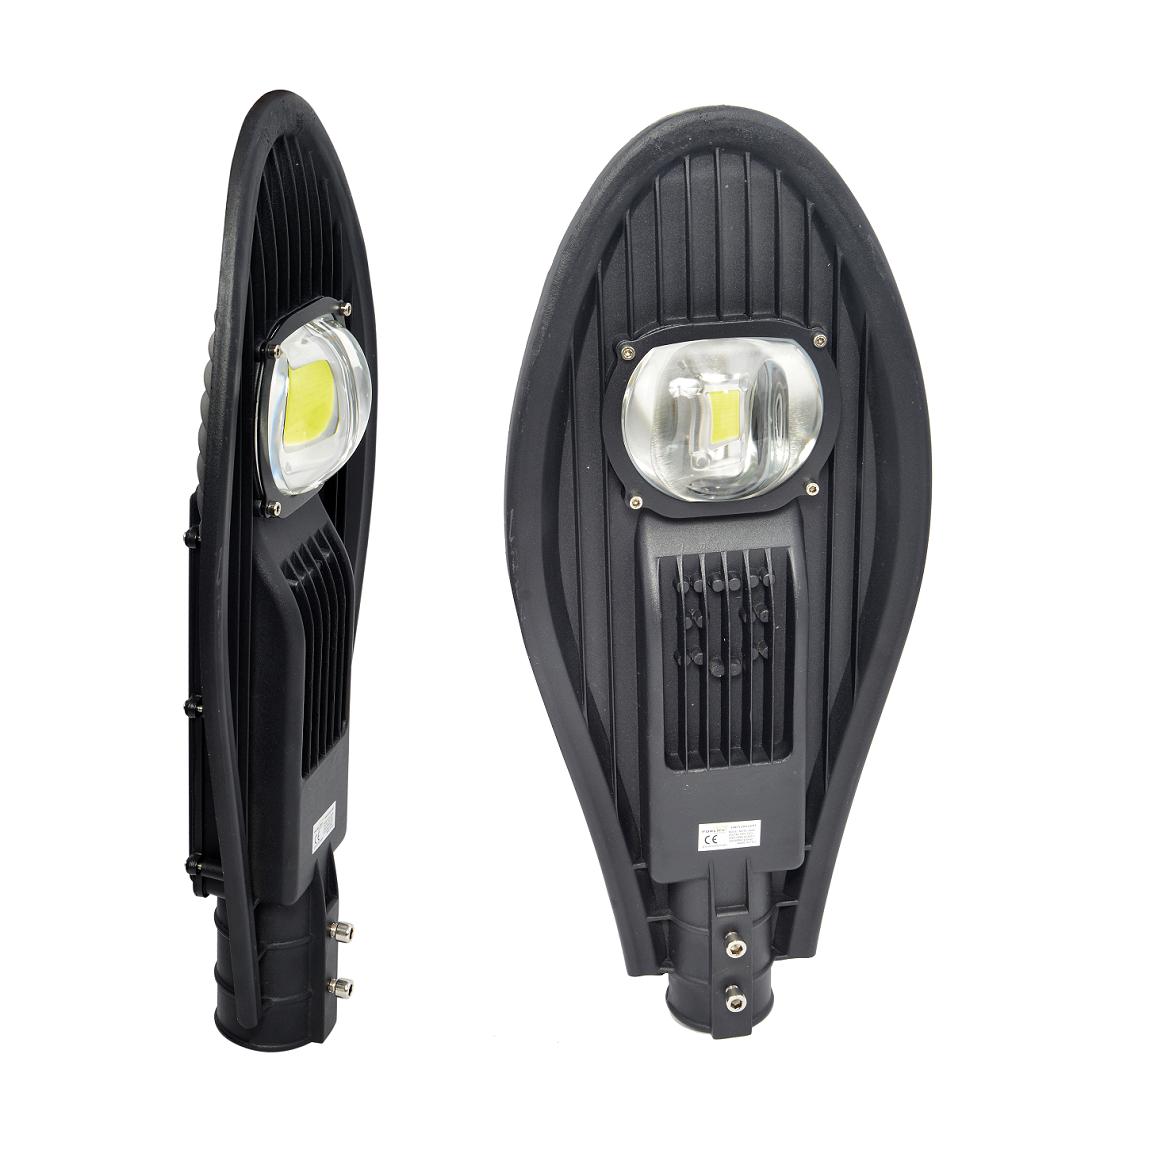 FORLIFE FL-6030 - 50 Watt COB LED Sokak Armatürü